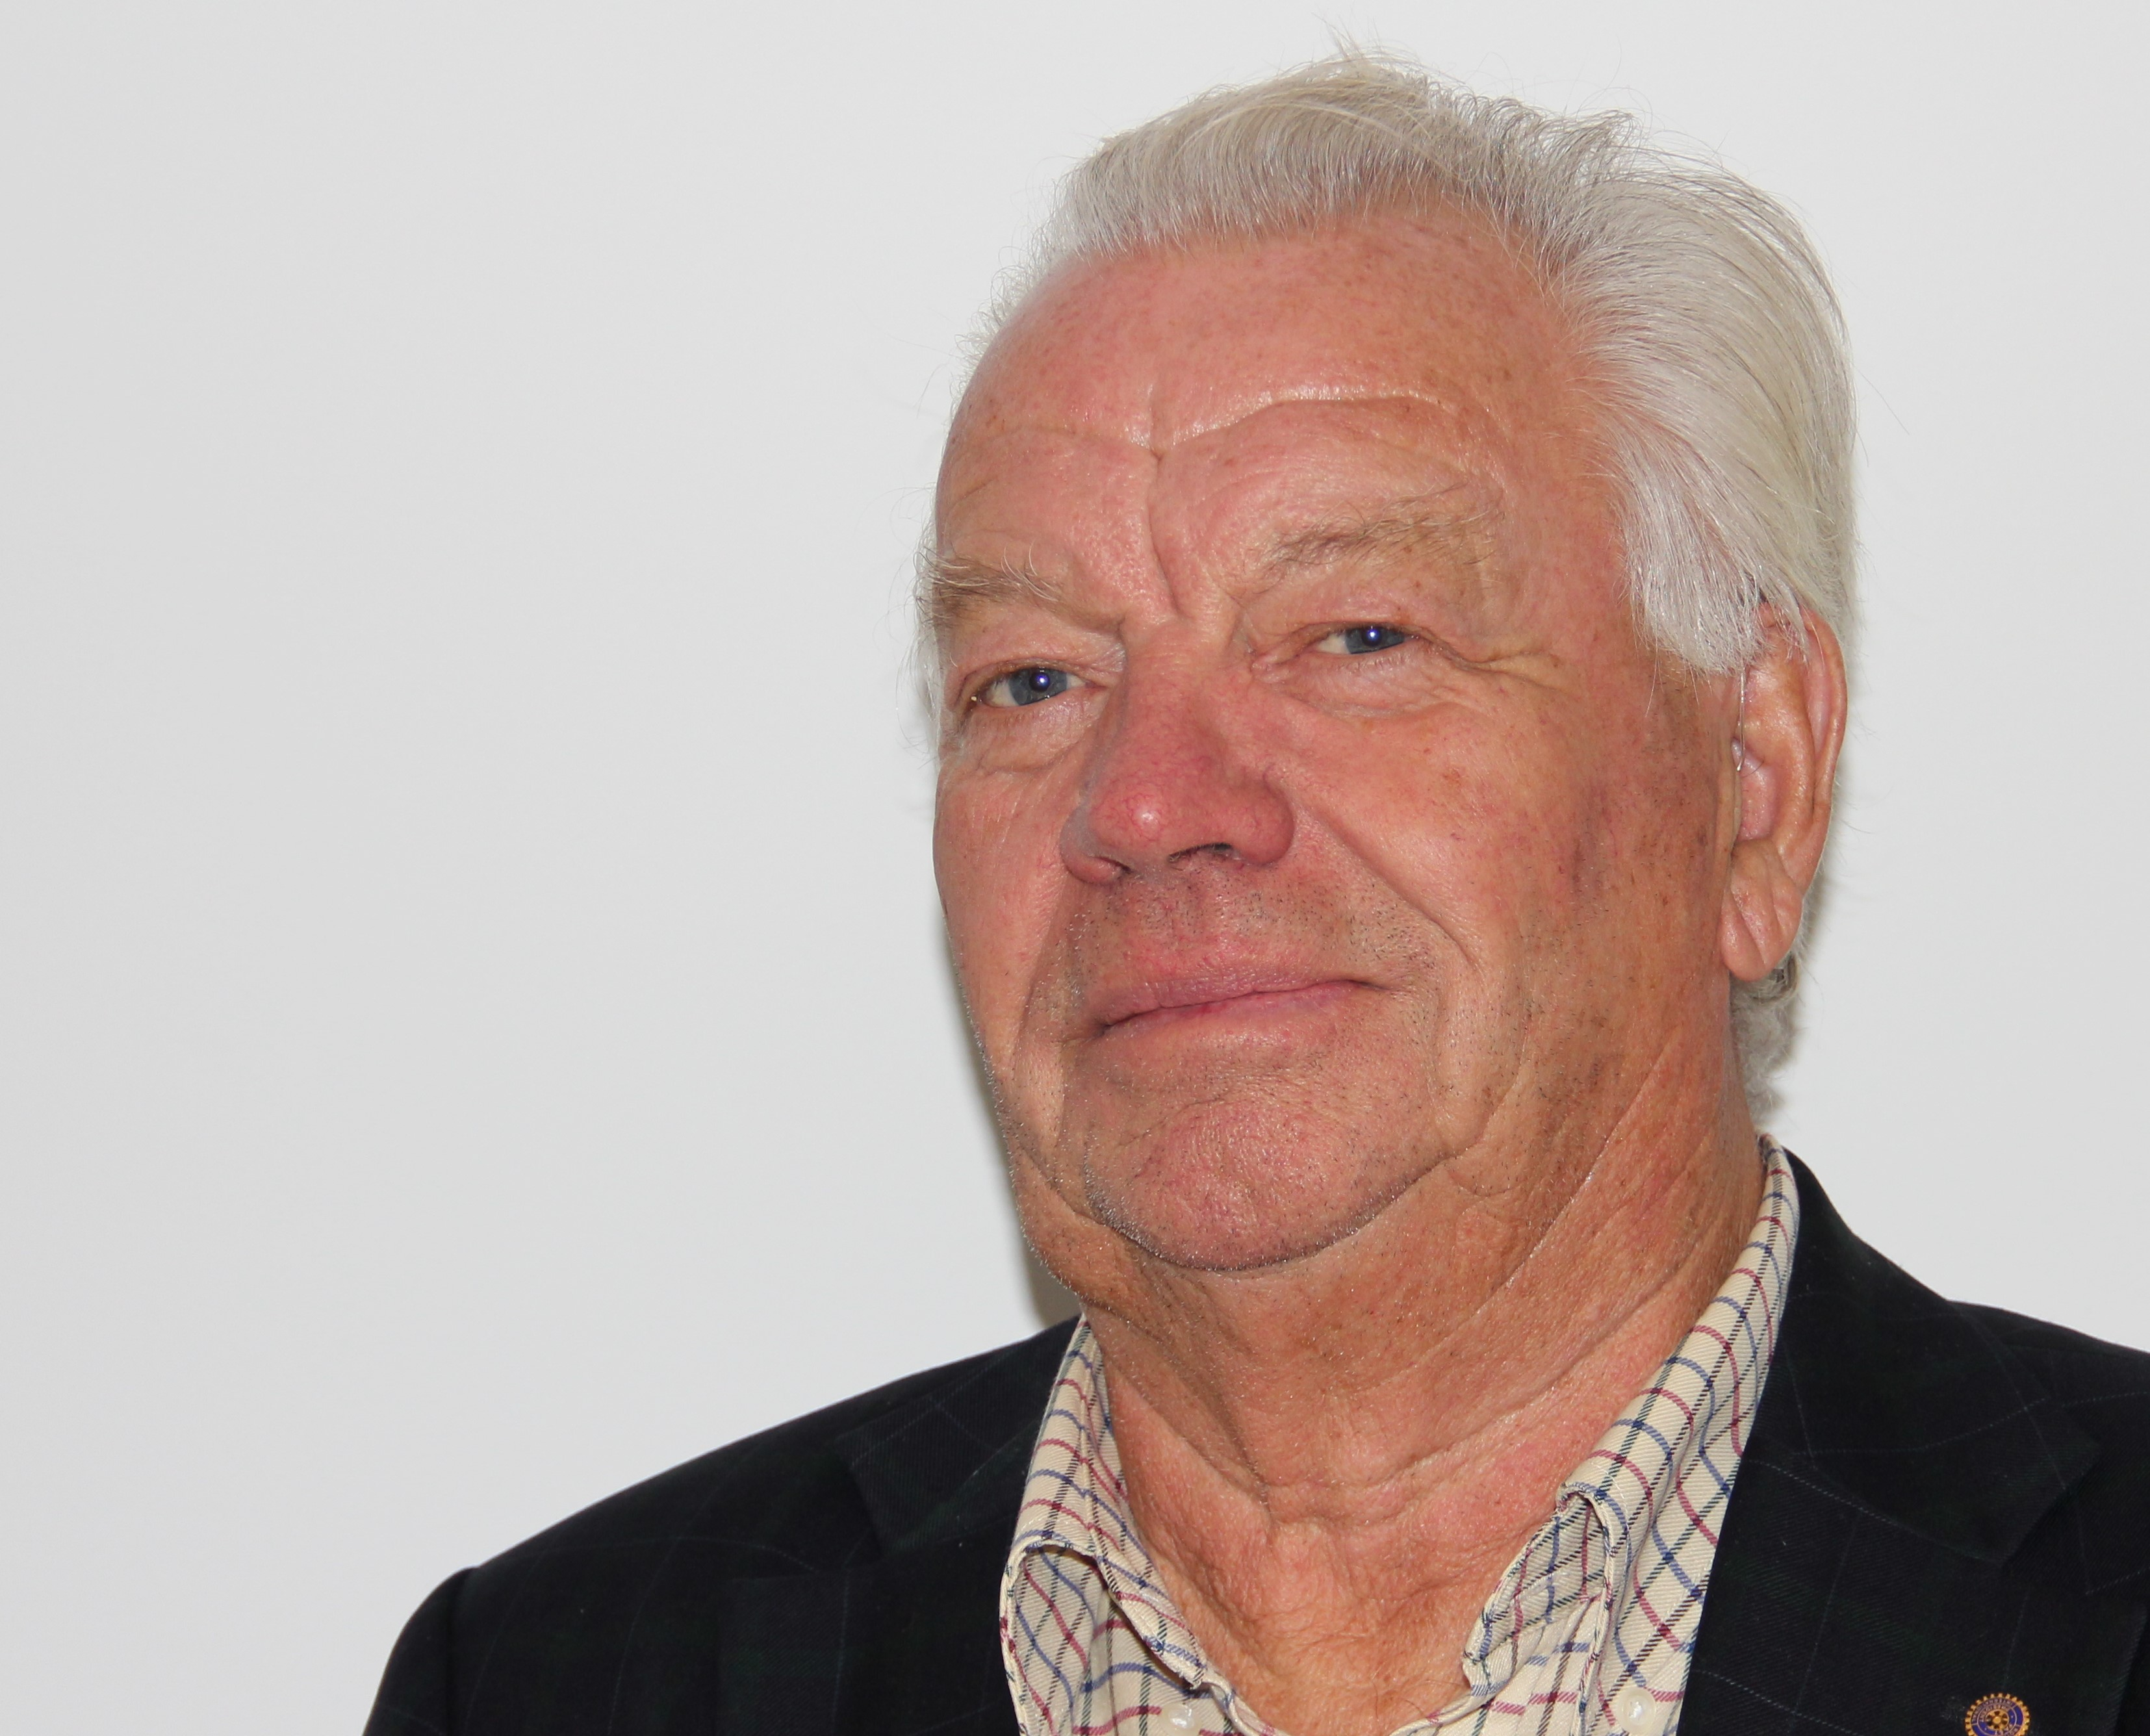 Håkan S Lundberg